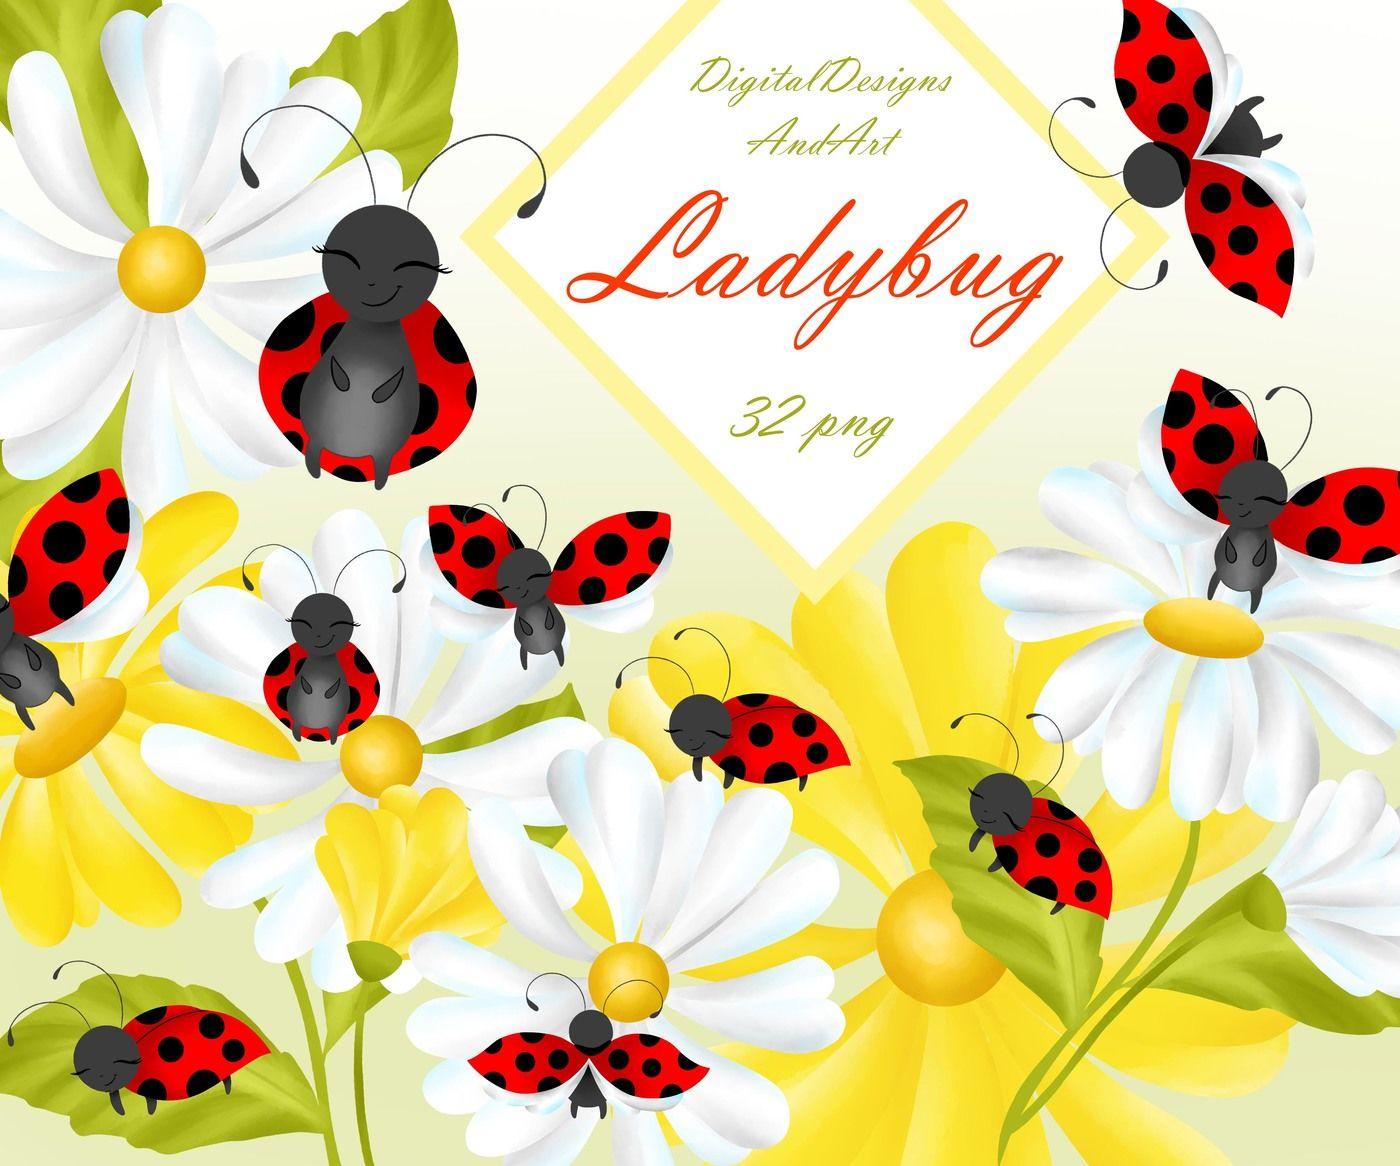 Ladybug Clipart By Digitaldesignsandart Thehungryjpeg Com